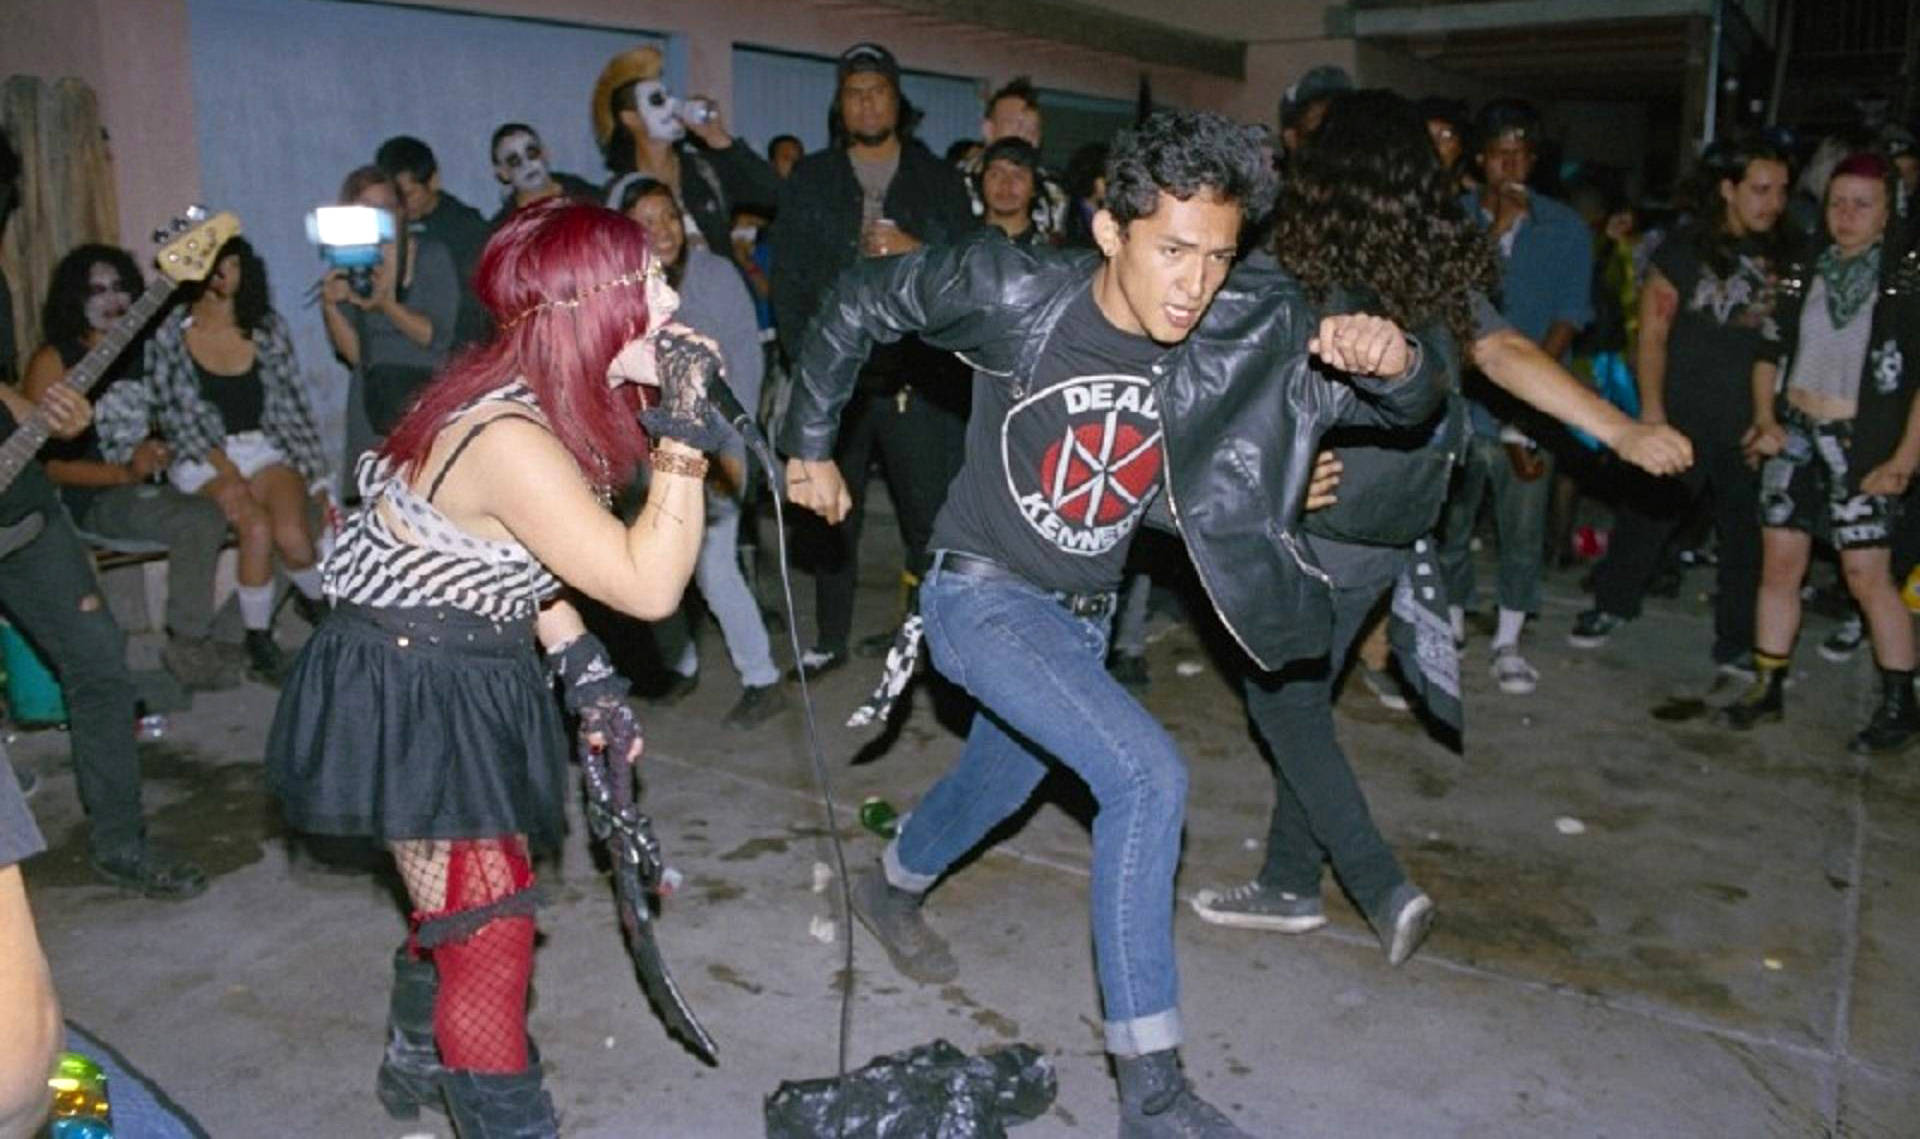 The band CXA performs at a backyard show.  Photo: Angela Boatwright